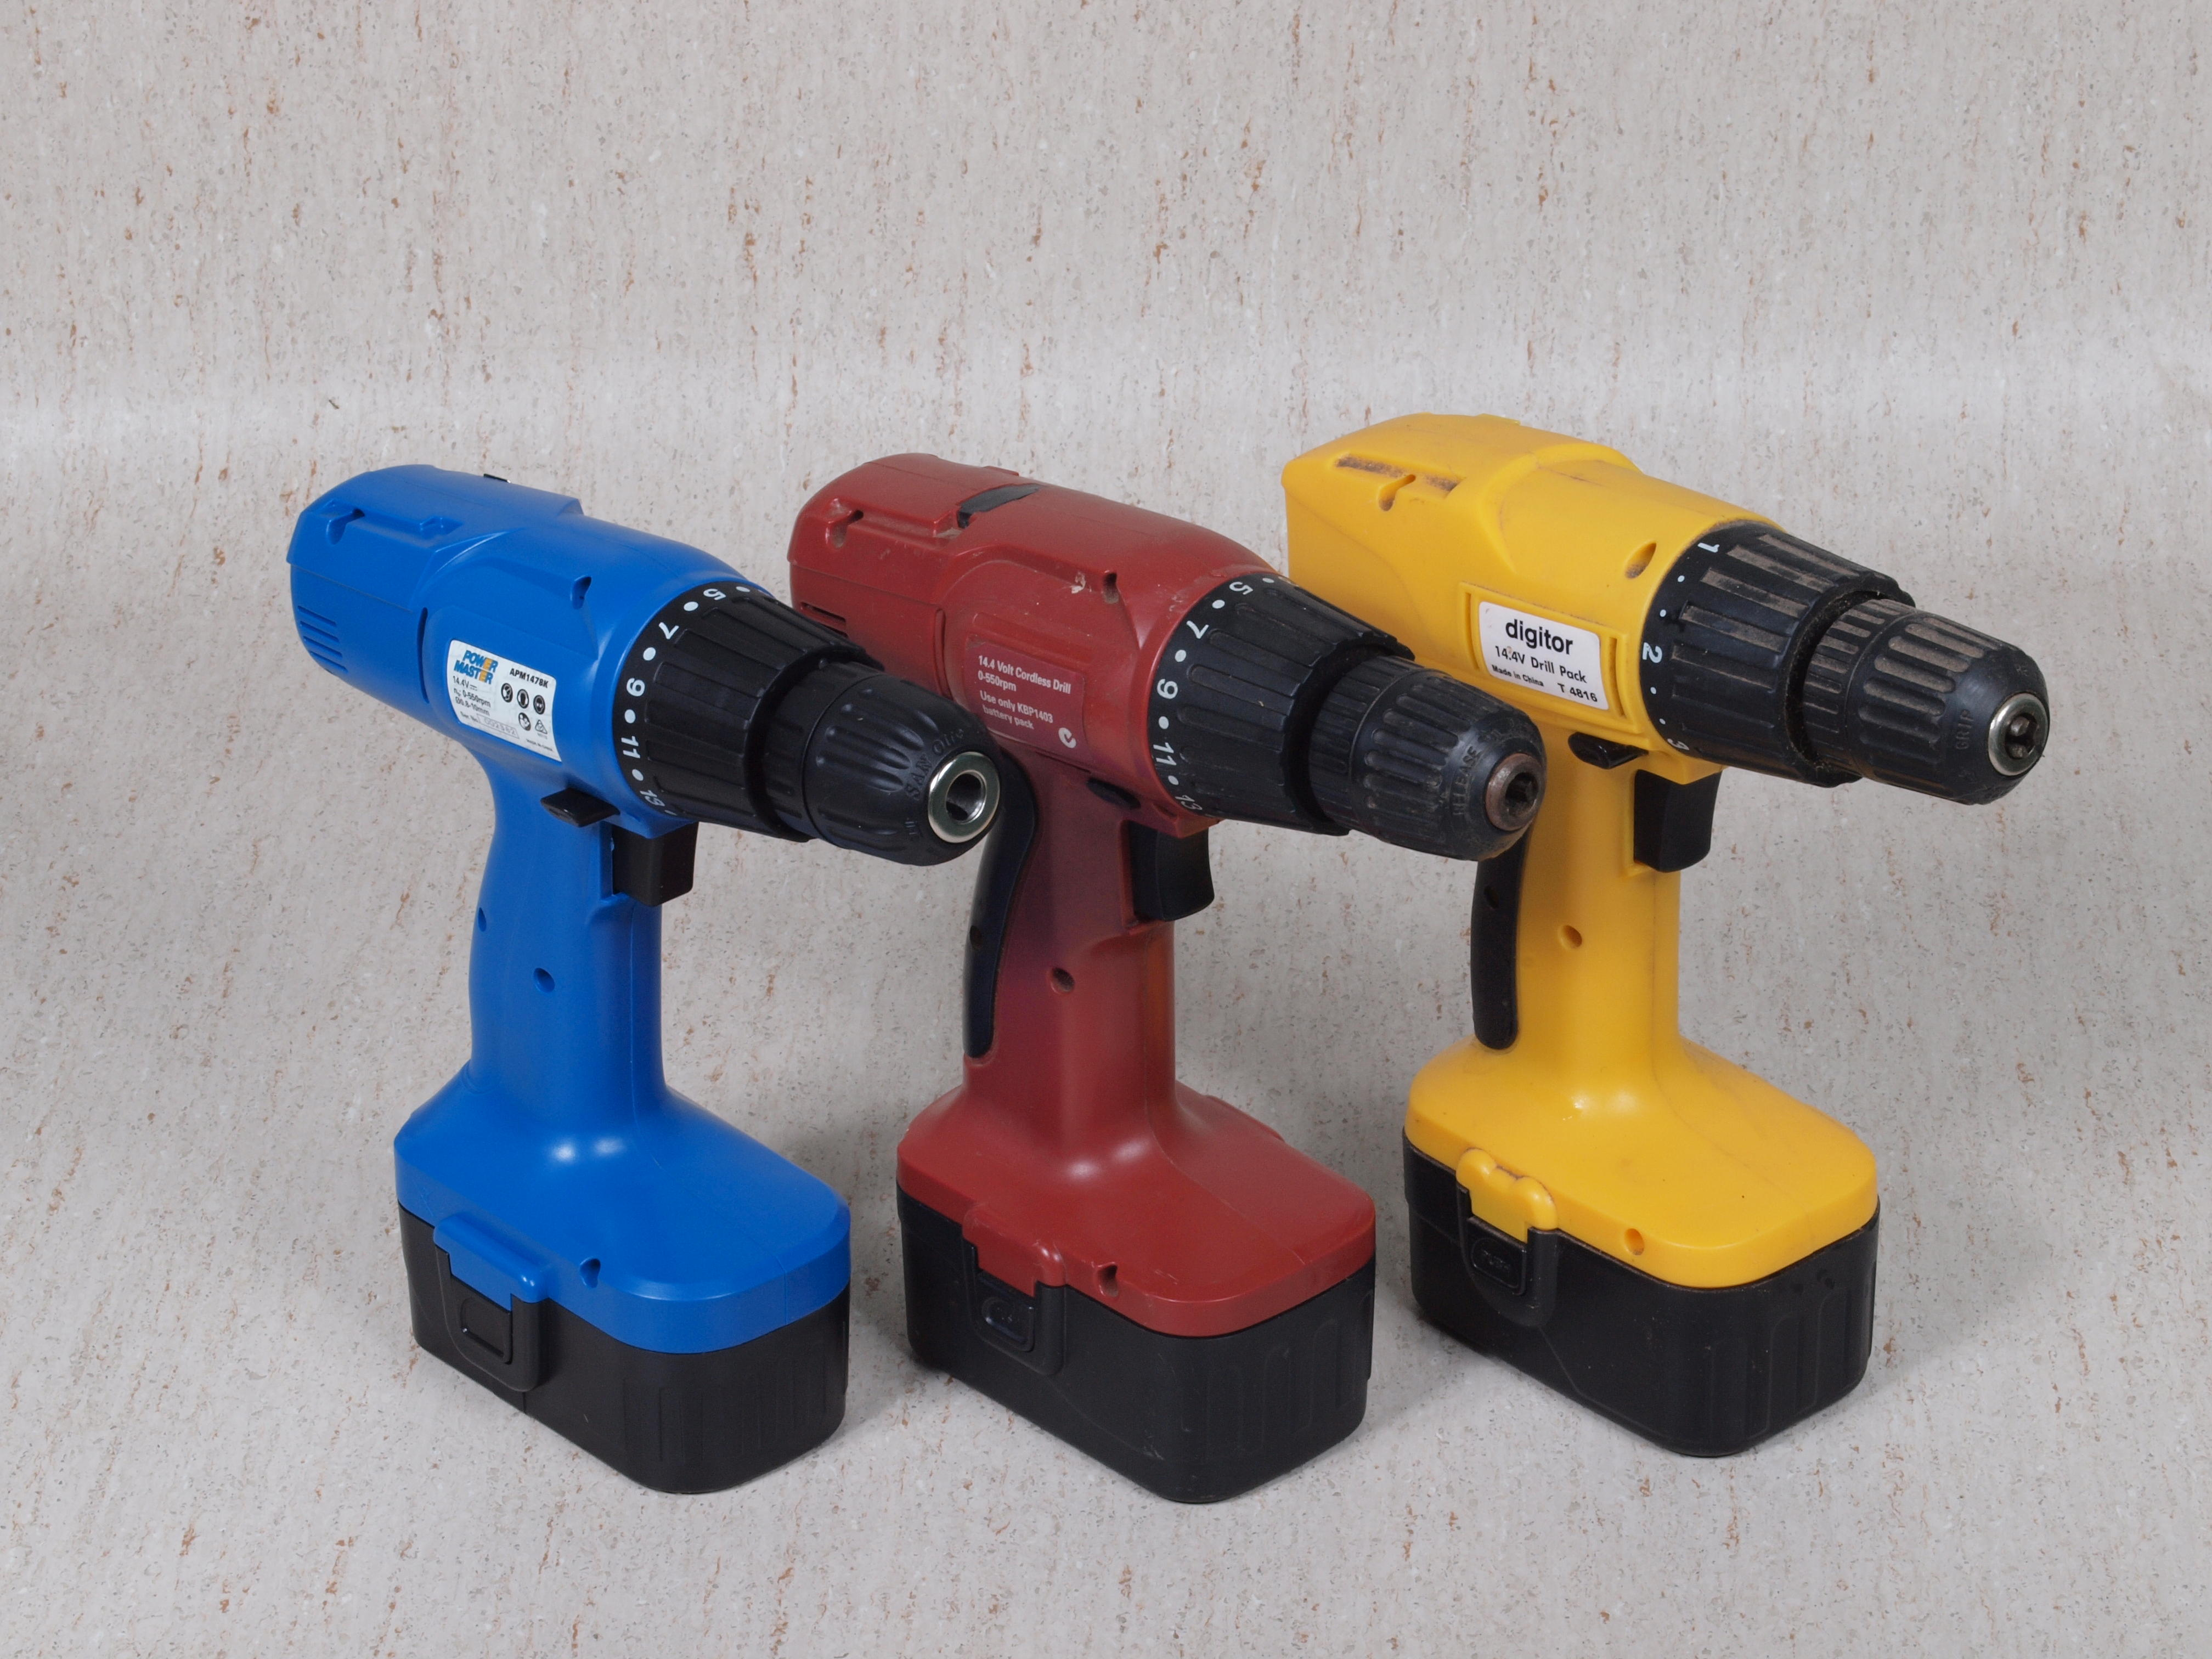 Cordless-drills-1.jpeg